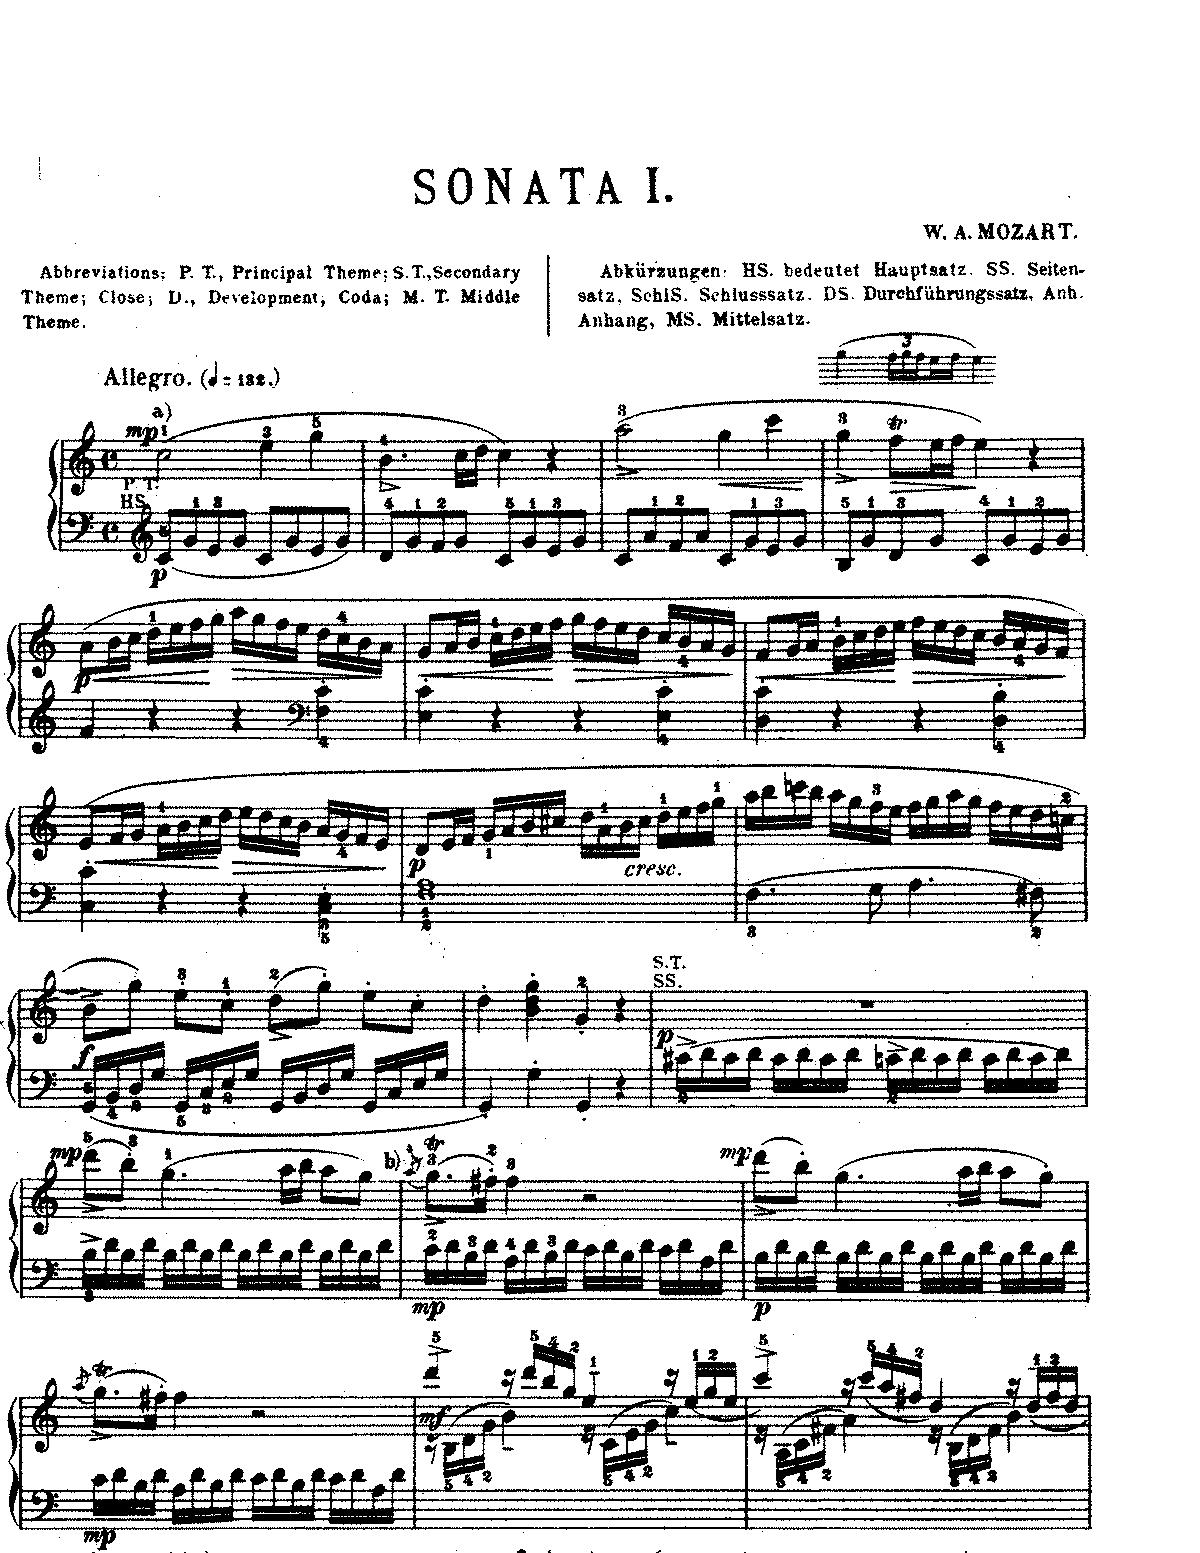 Mozarts Piano Sonata No. 8 in A Minor Program Note